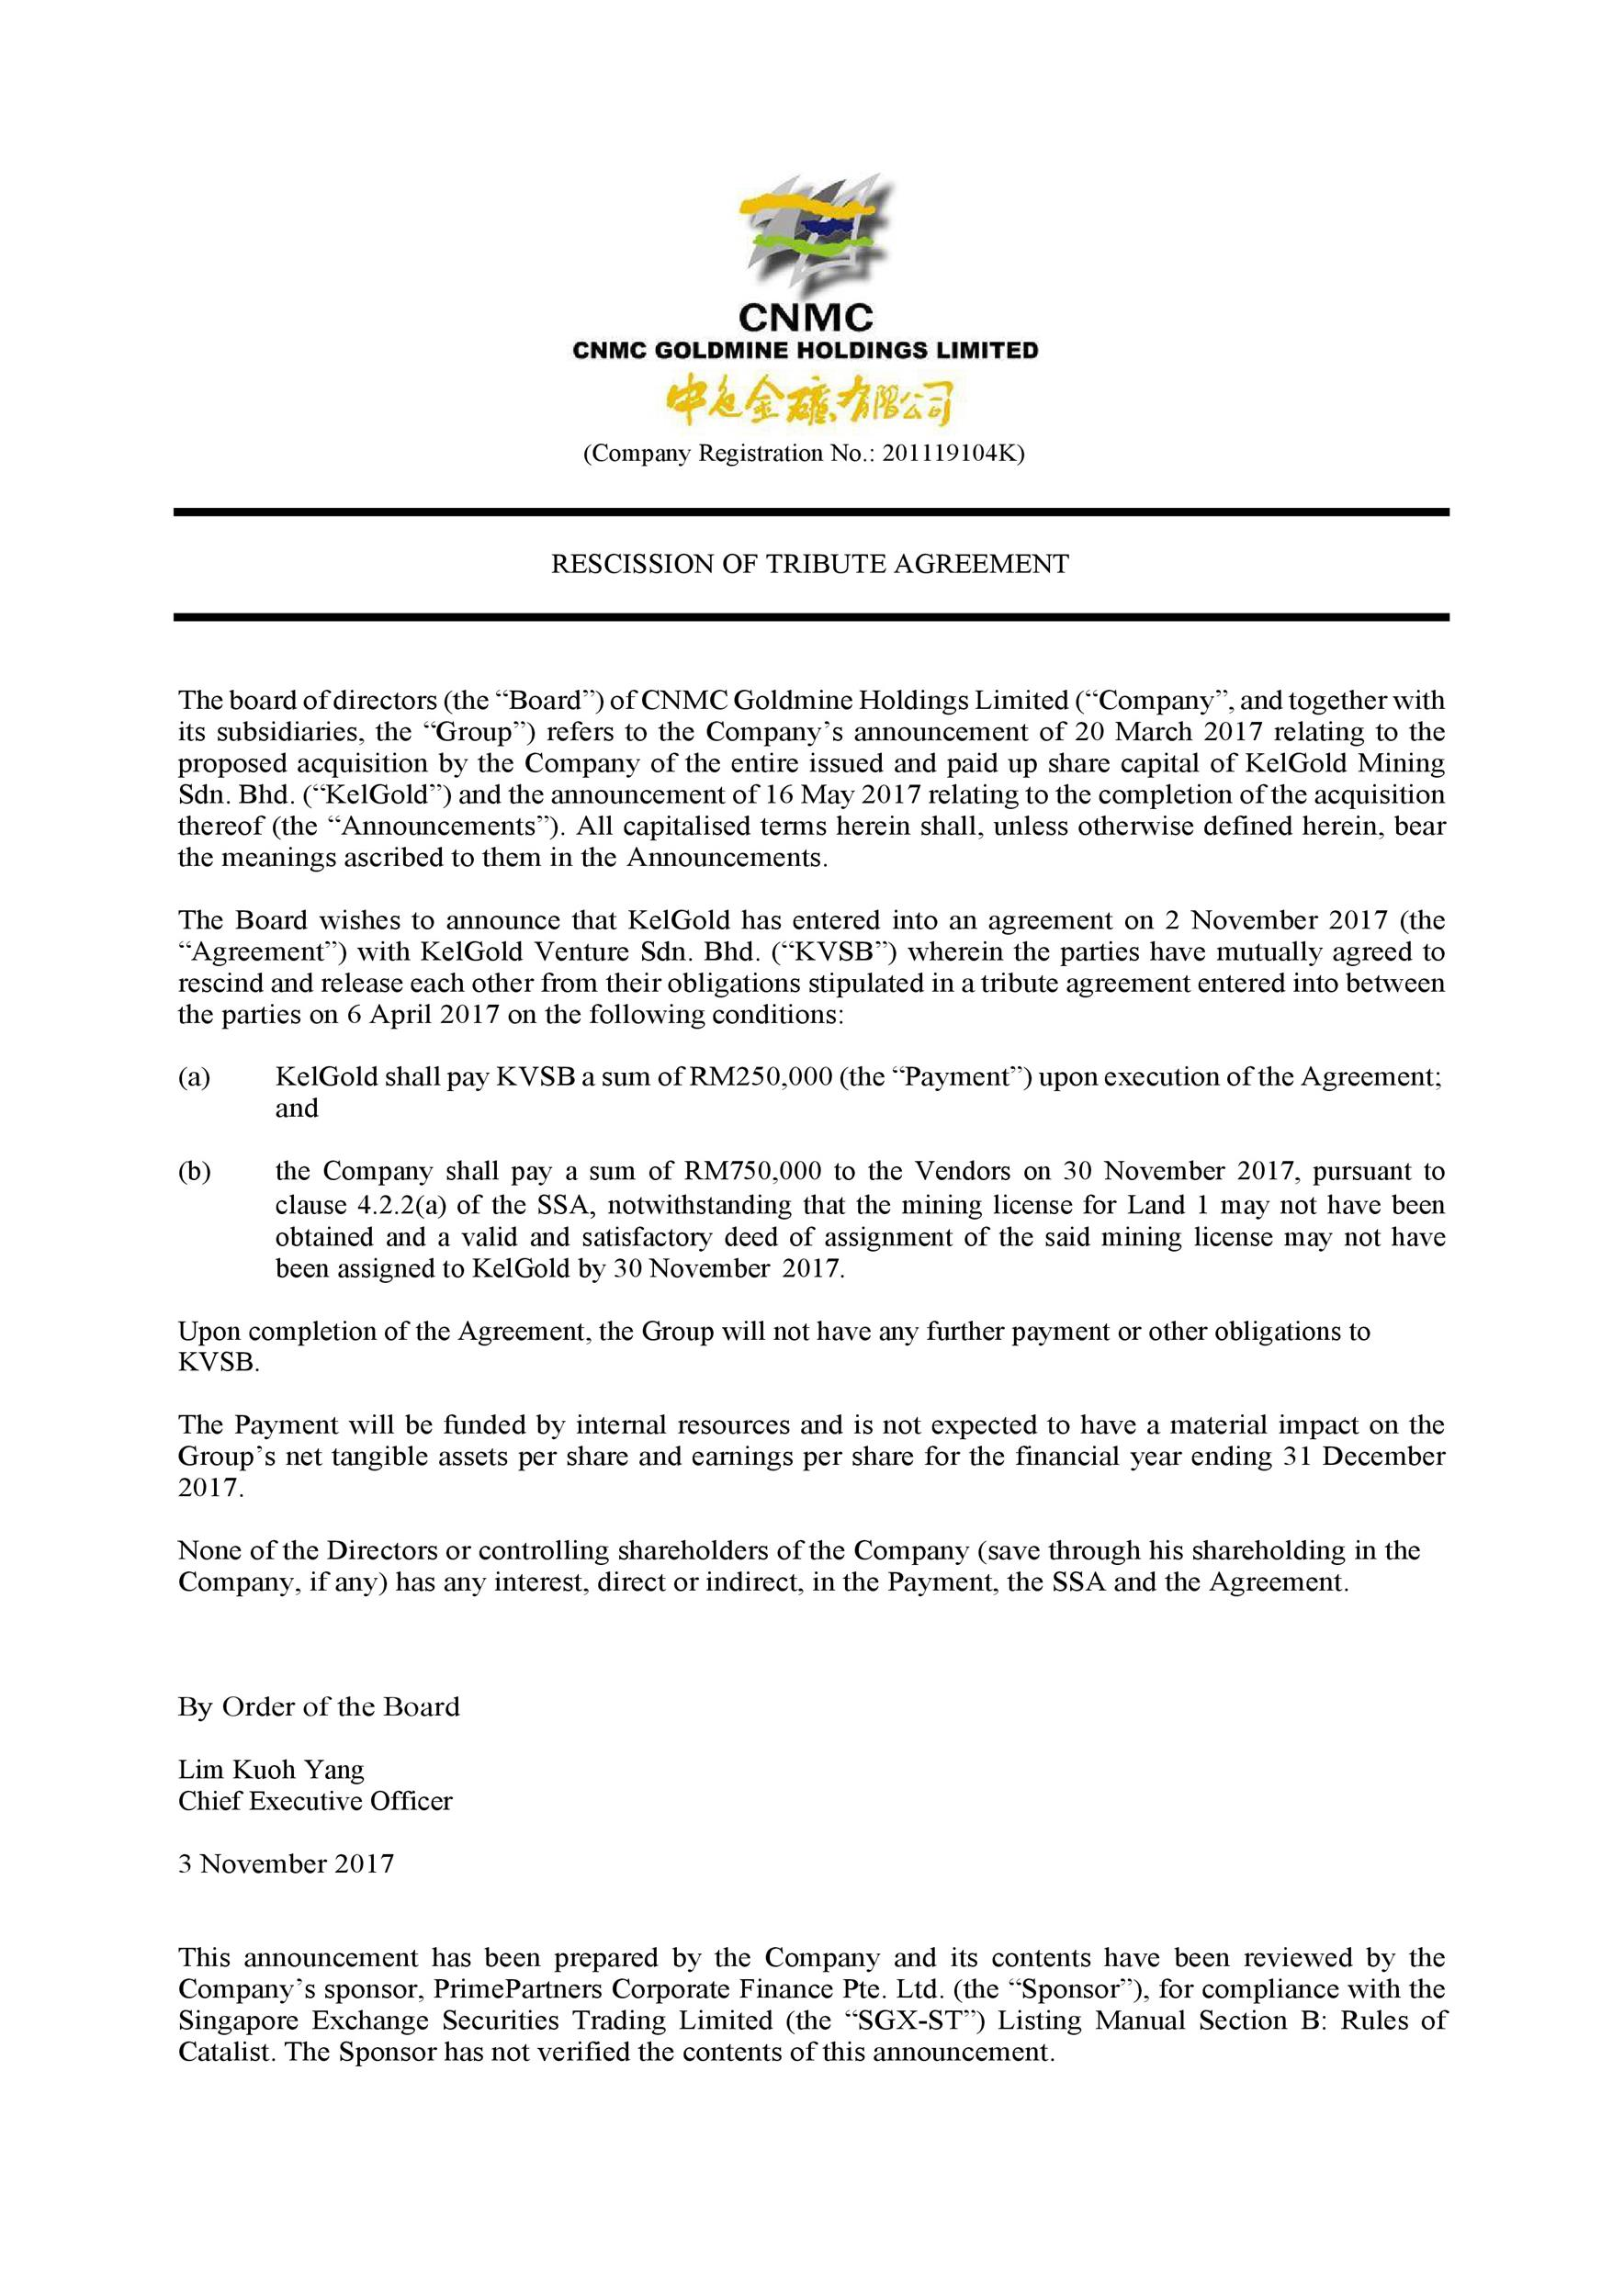 Free rescission agreement 19